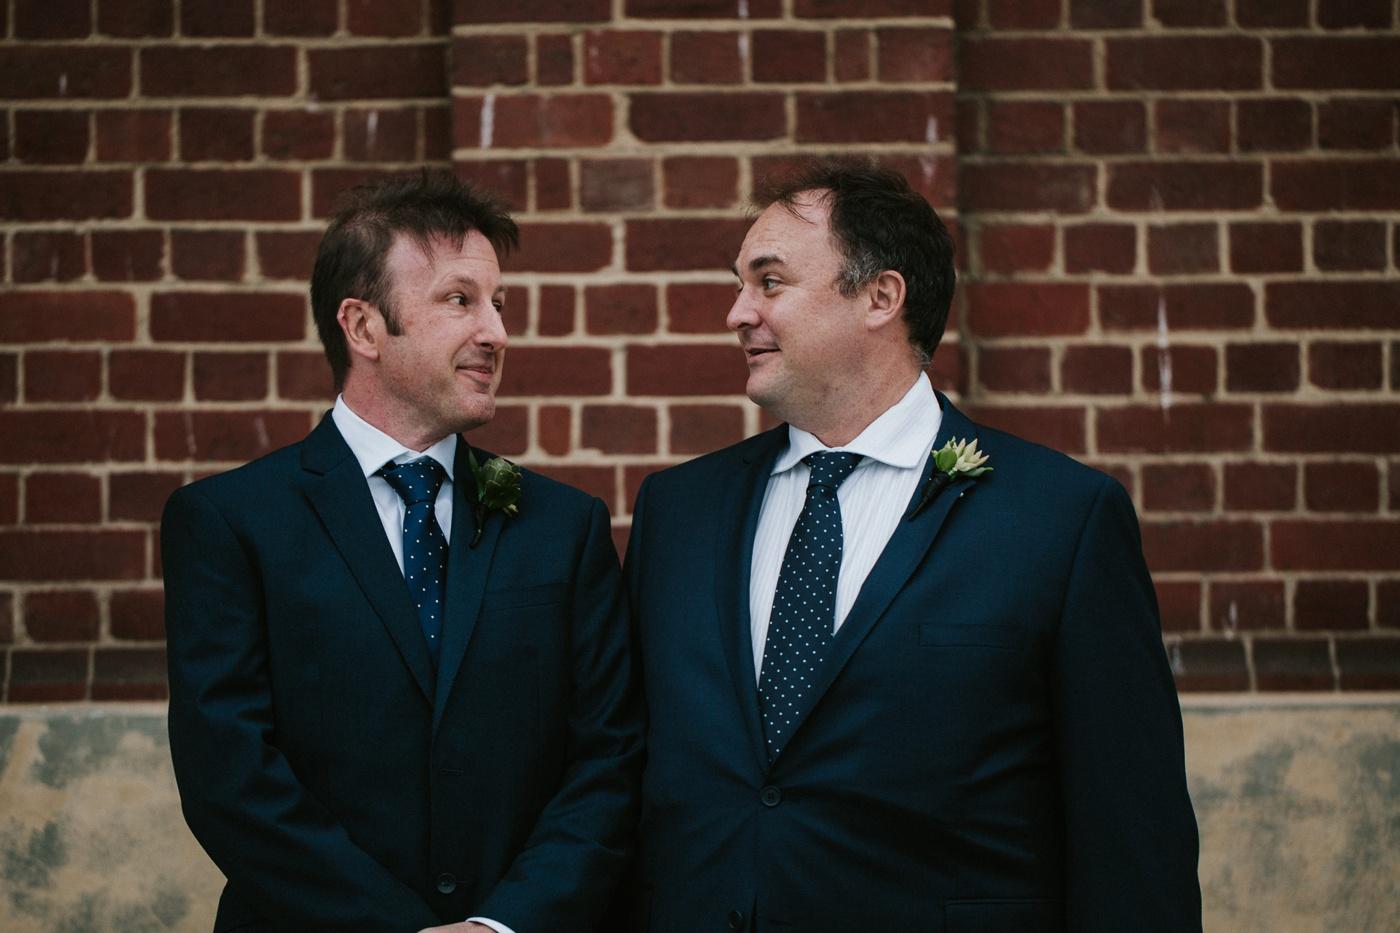 anitadaniel_melbourne-scienceworks-relaxed-fun-geek-wedding_melbourne-candid-wedding-photography_27